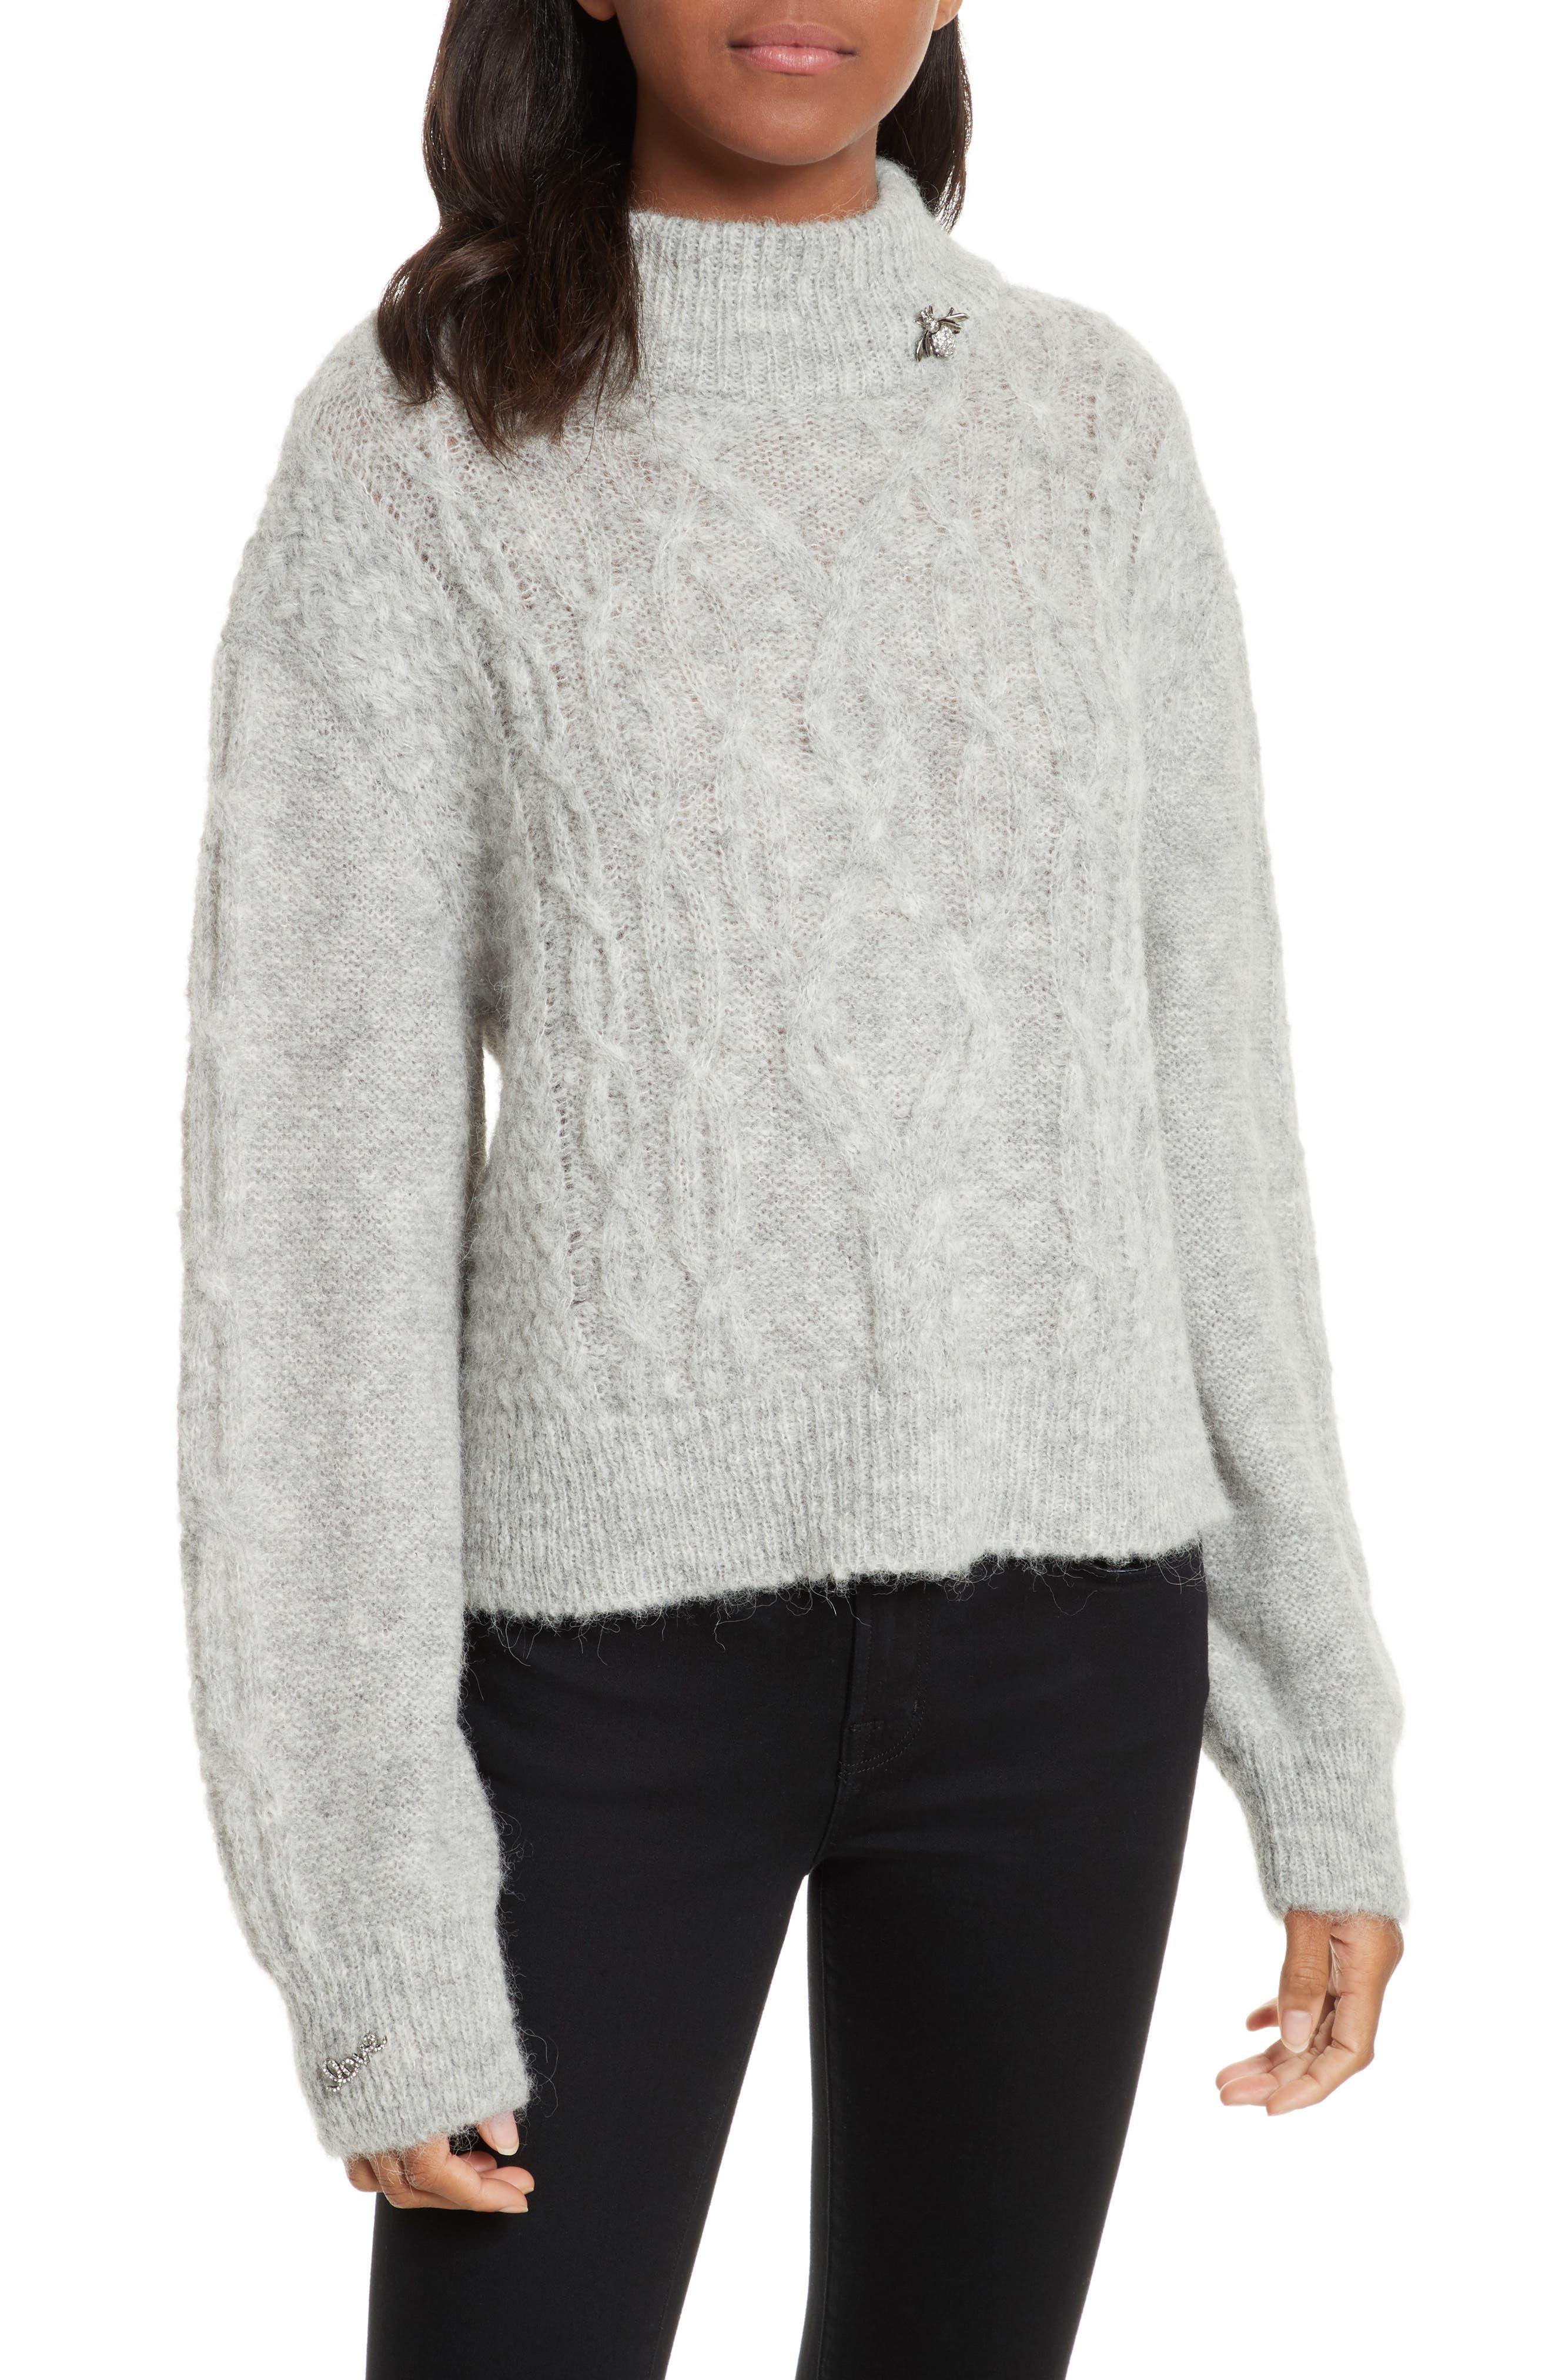 Joie Garlan Mock Neck Sweater